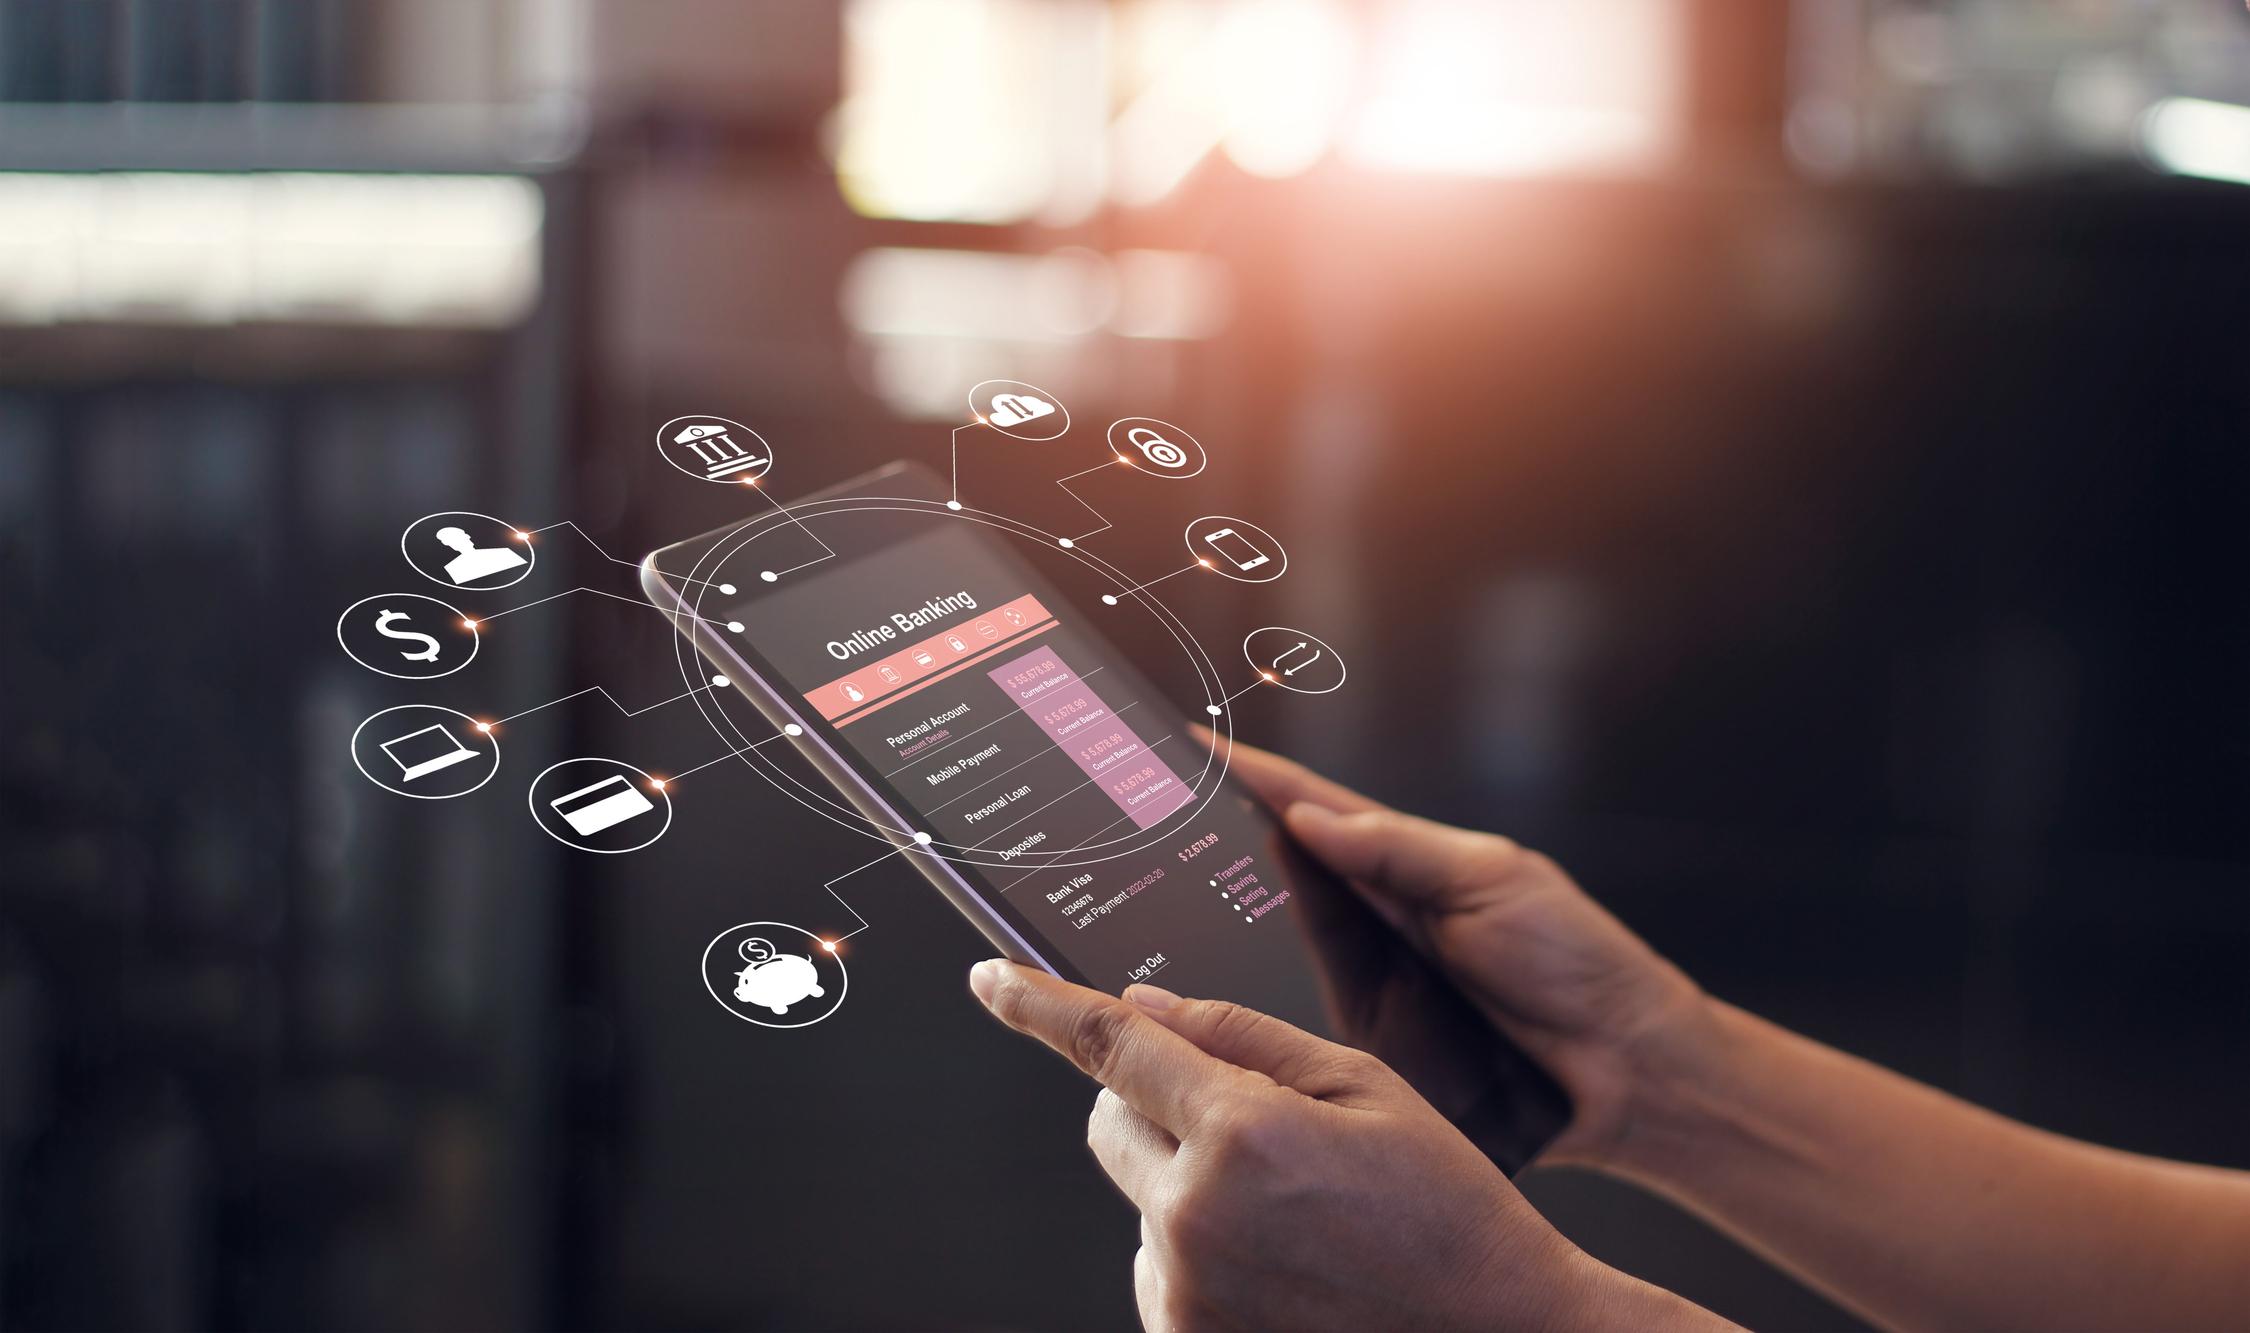 5 Key Drivers of Digital Banking in 2021